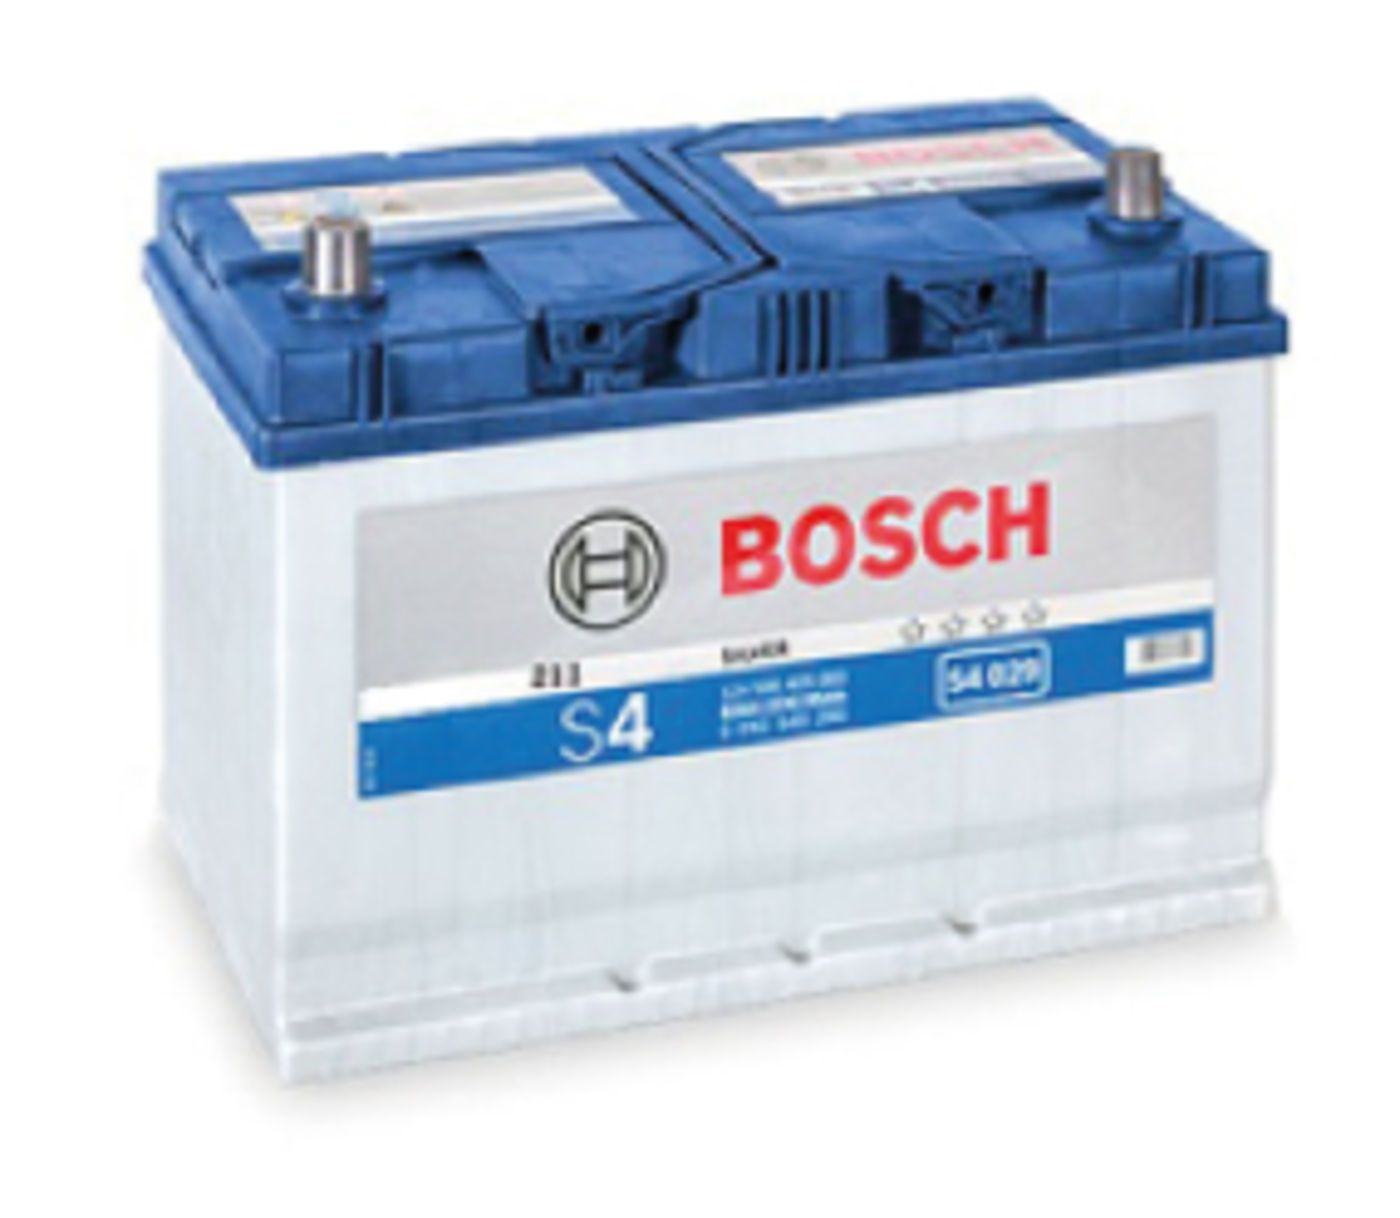 Bosch N 150 HD (4D)